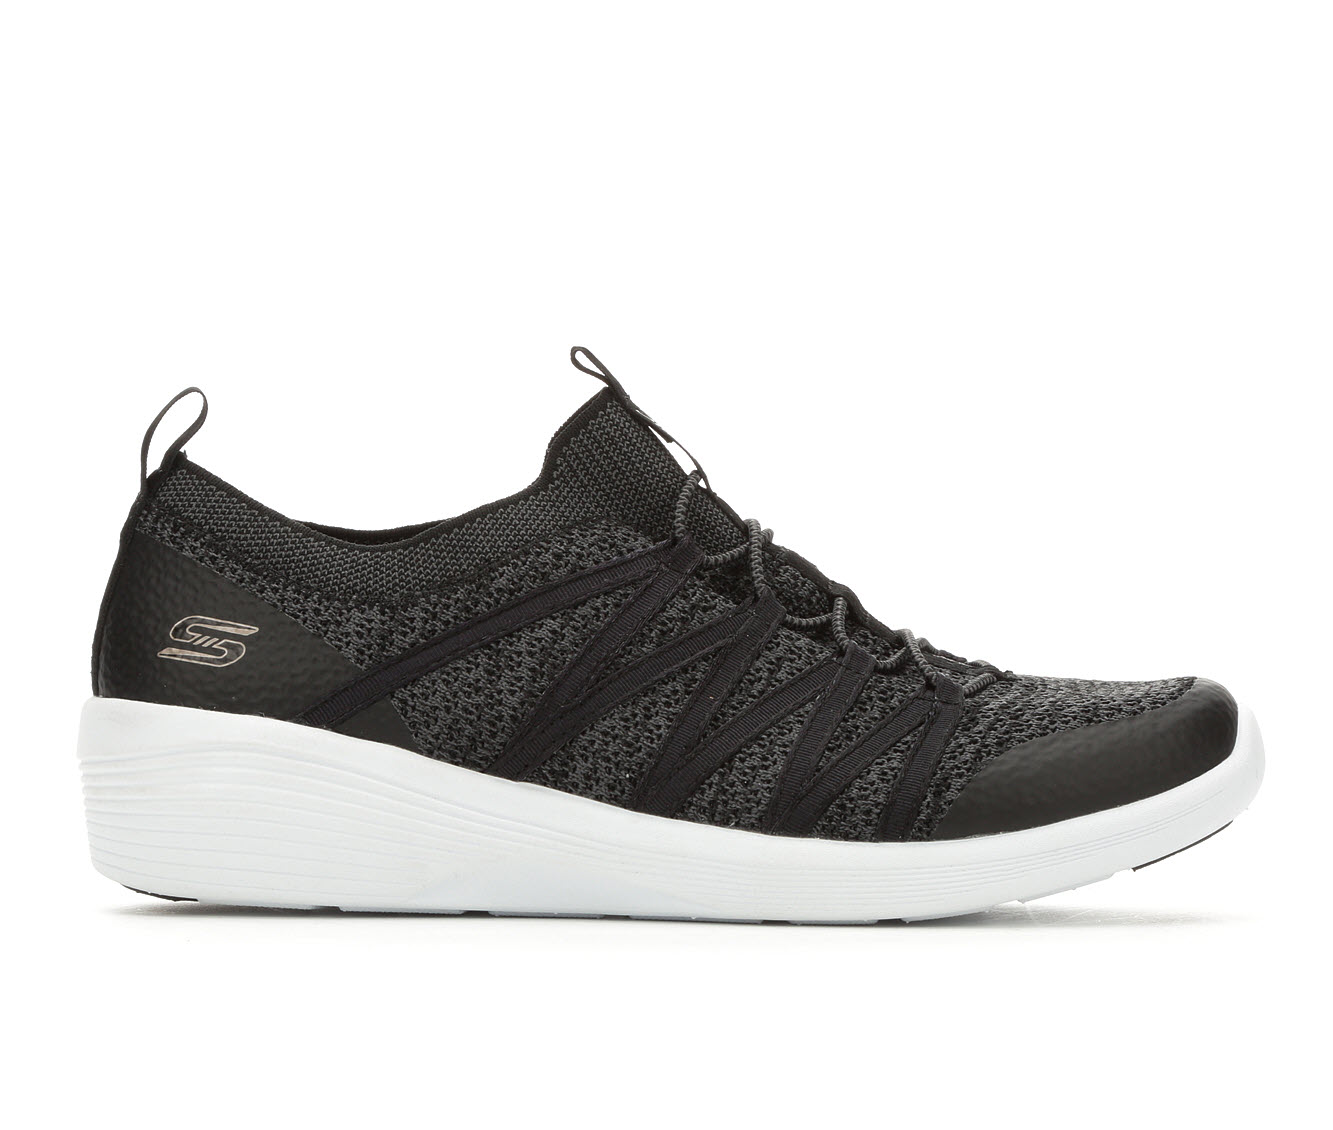 Skechers Arya 23757 Women's Shoe (Black Canvas)